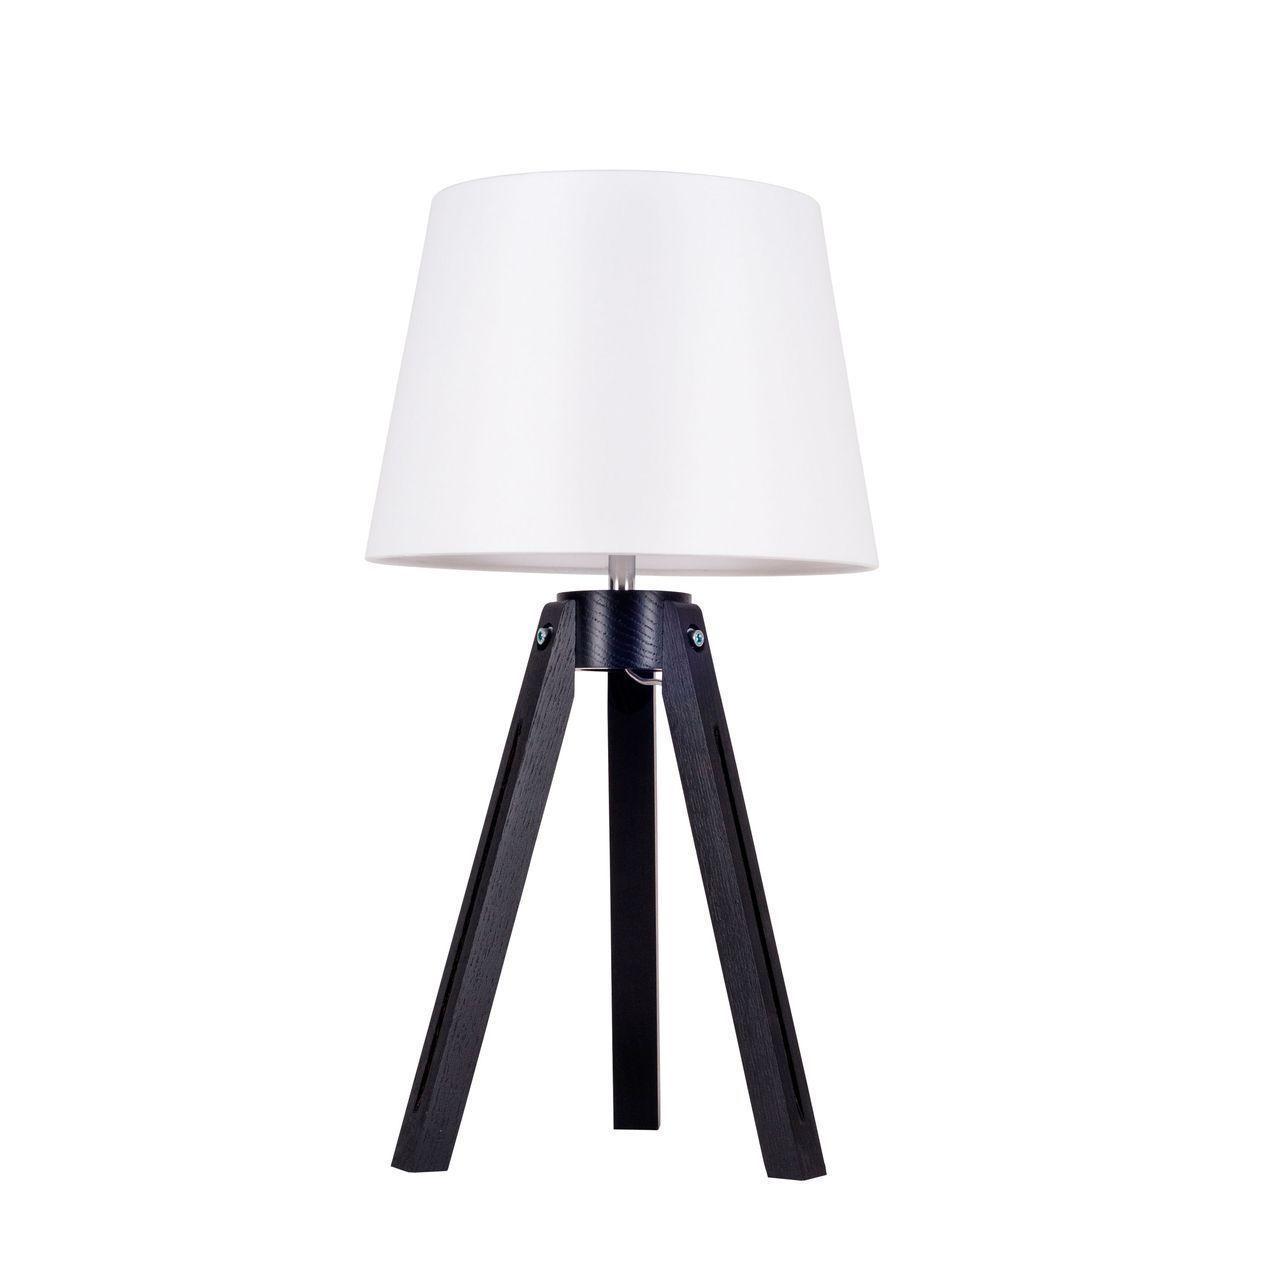 Настольная лампа Spot Light Tripod 6111004 настольная лампа spot light tripod oak 6114070